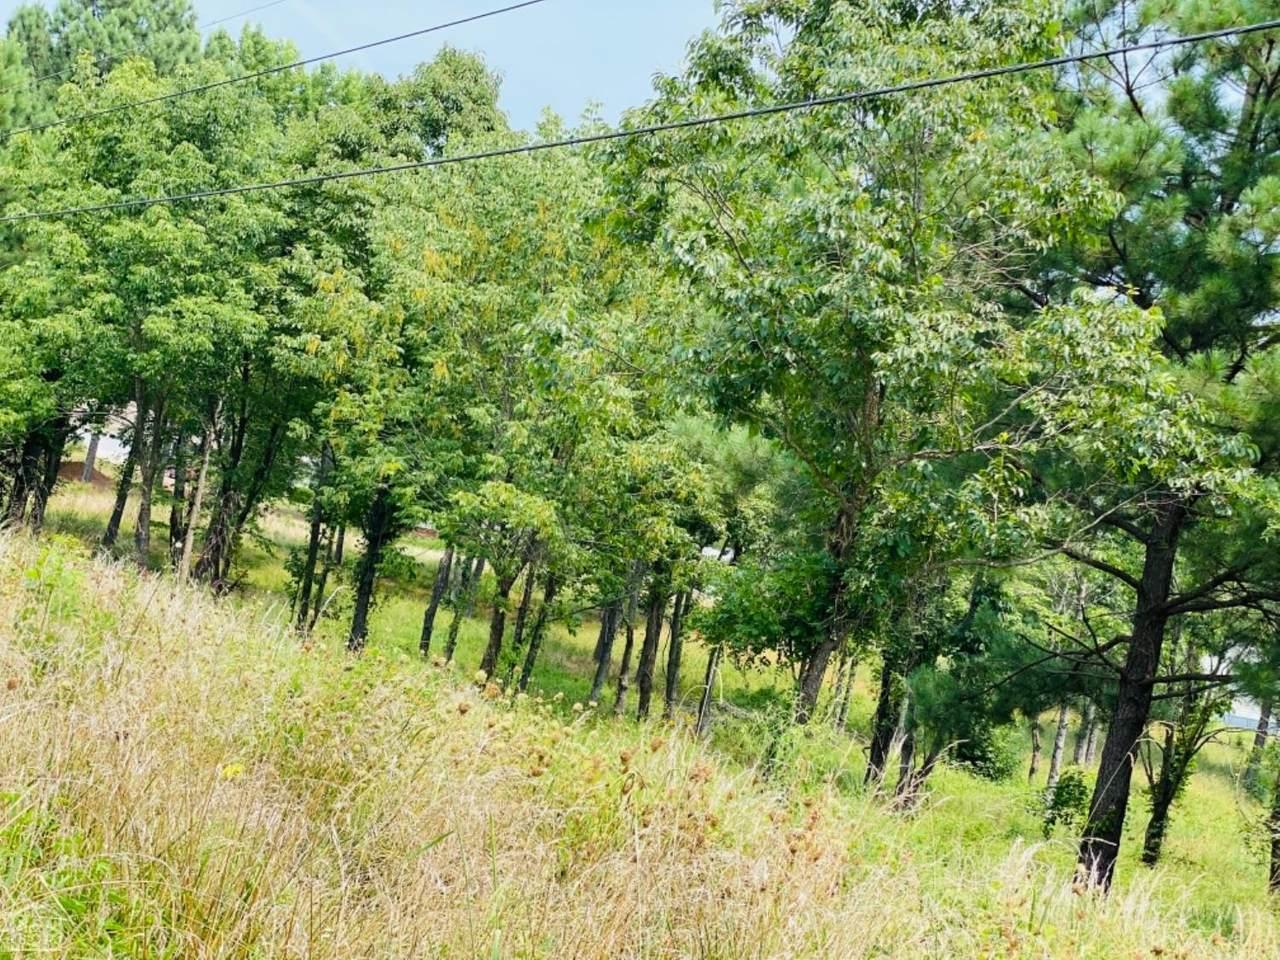 719 Persimmion Ridge - Photo 1